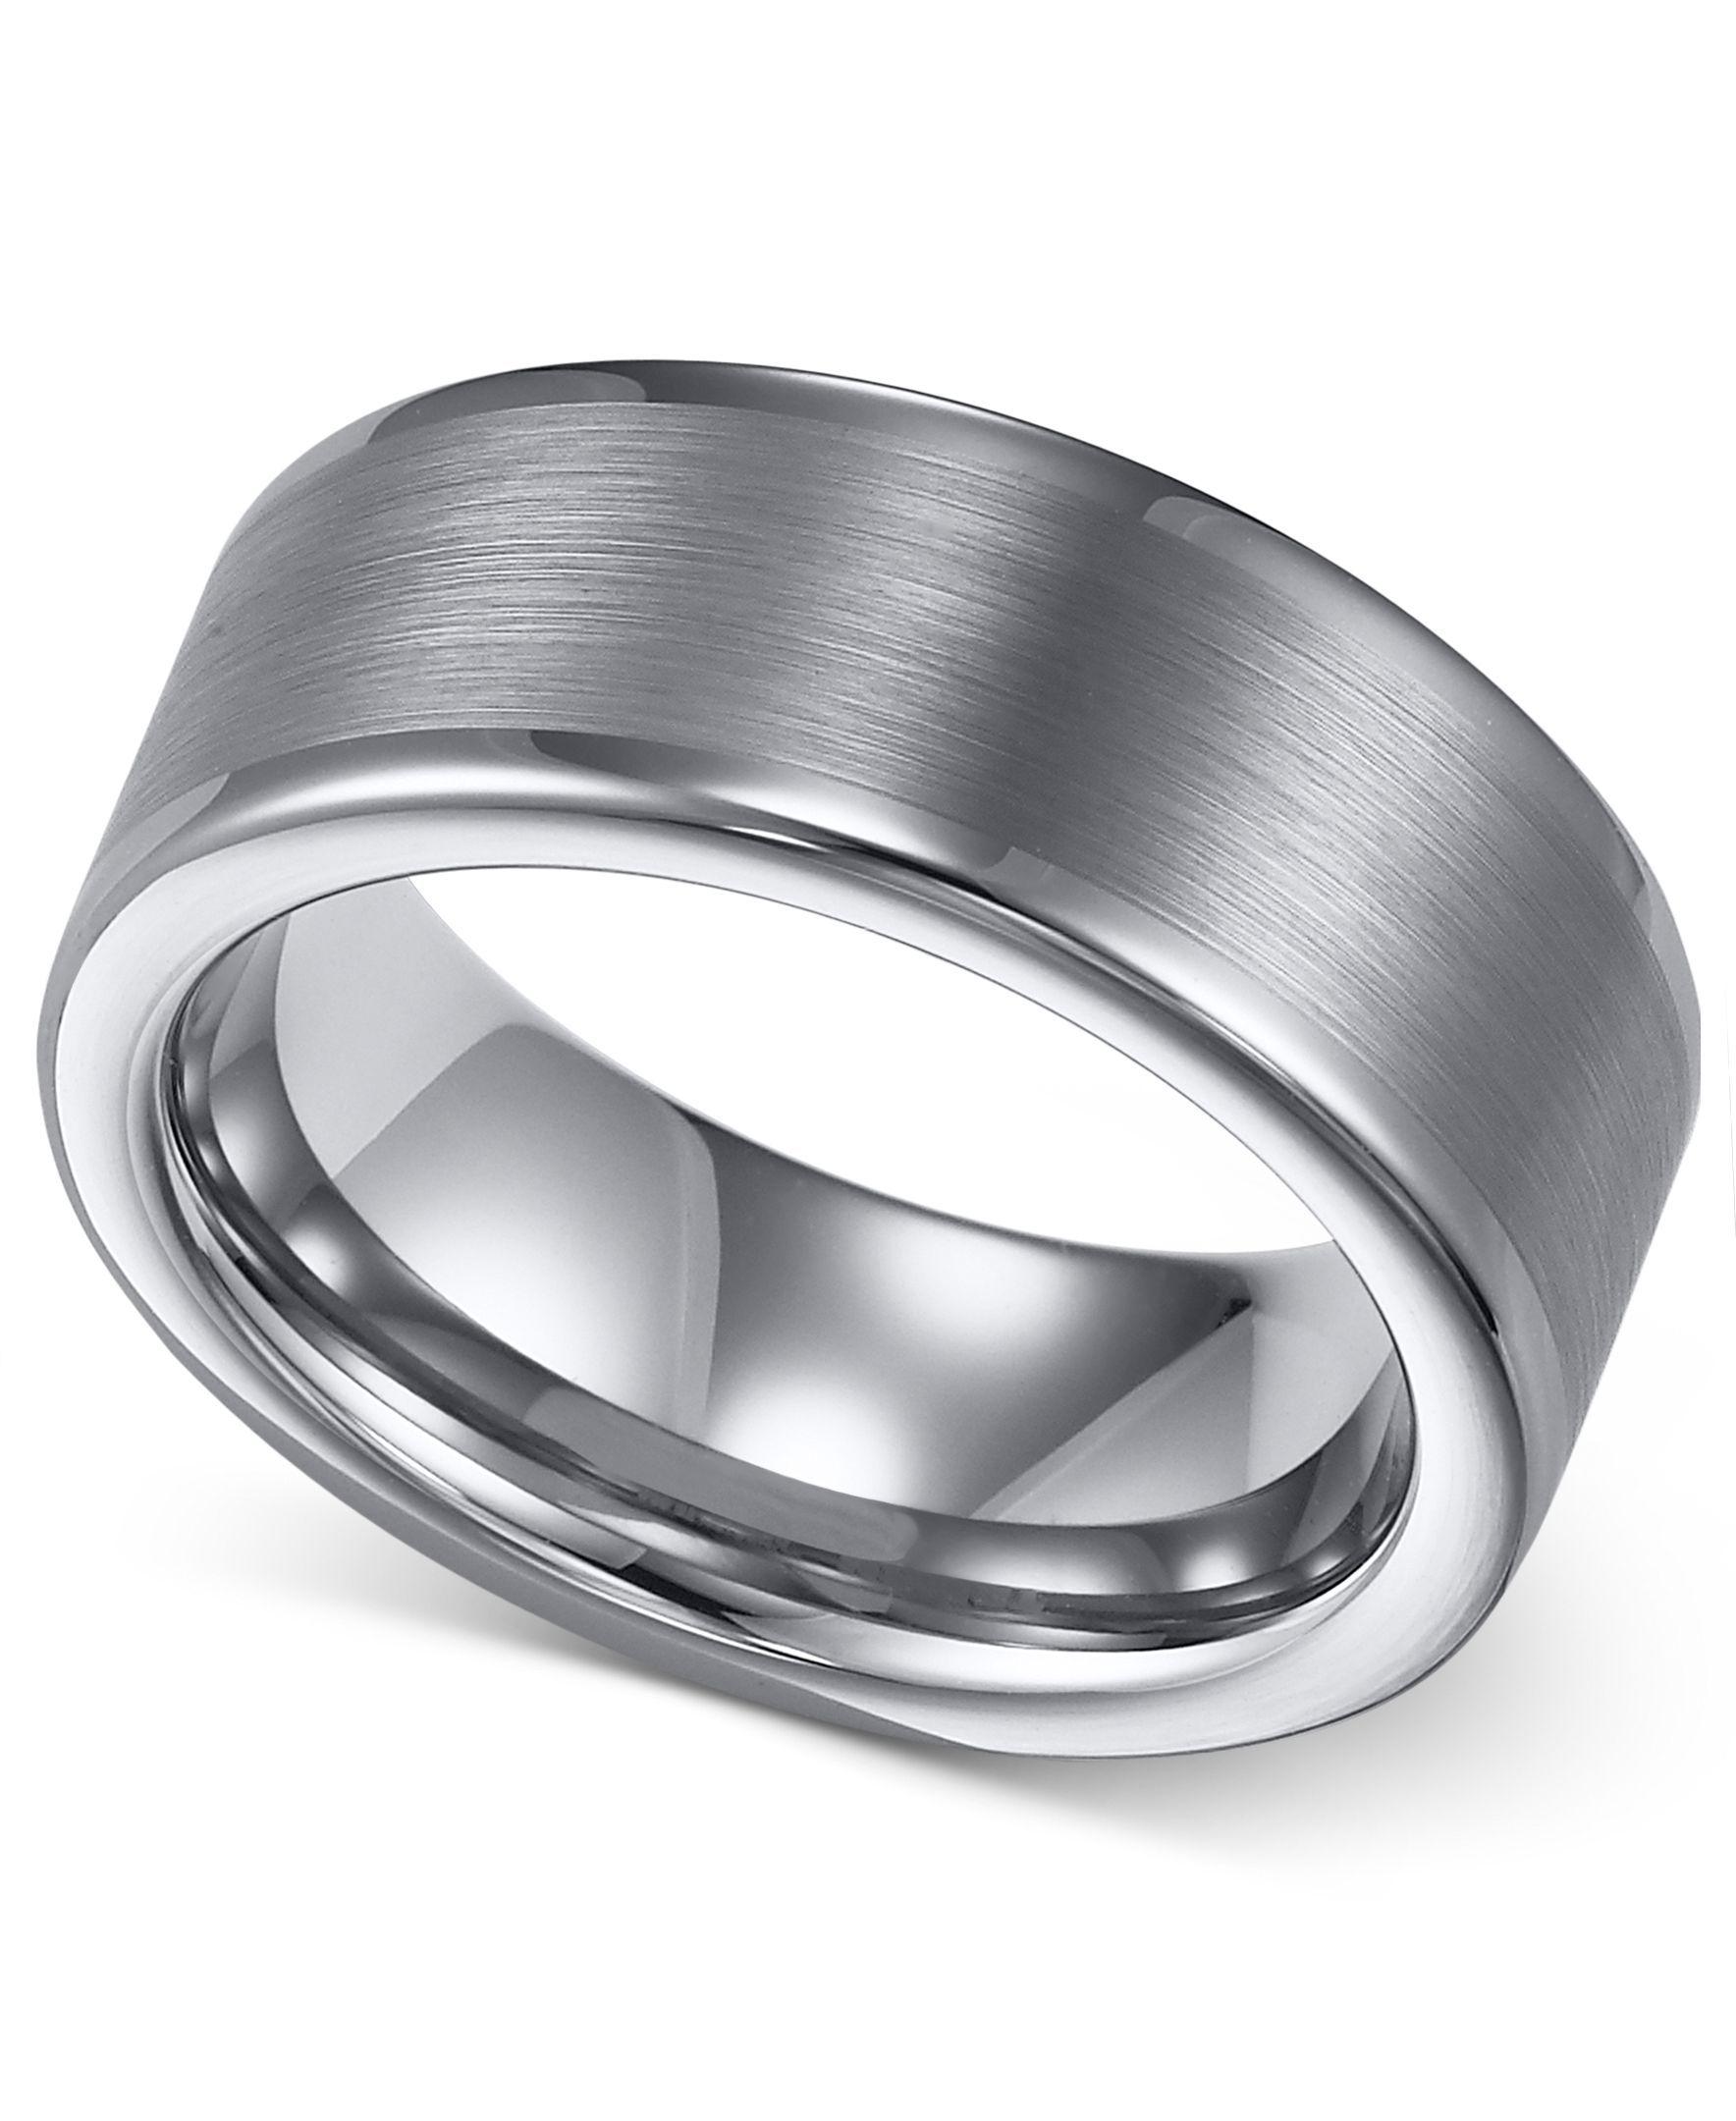 Triton Men's Tungsten Ring, 8mm Wedding Band & Reviews